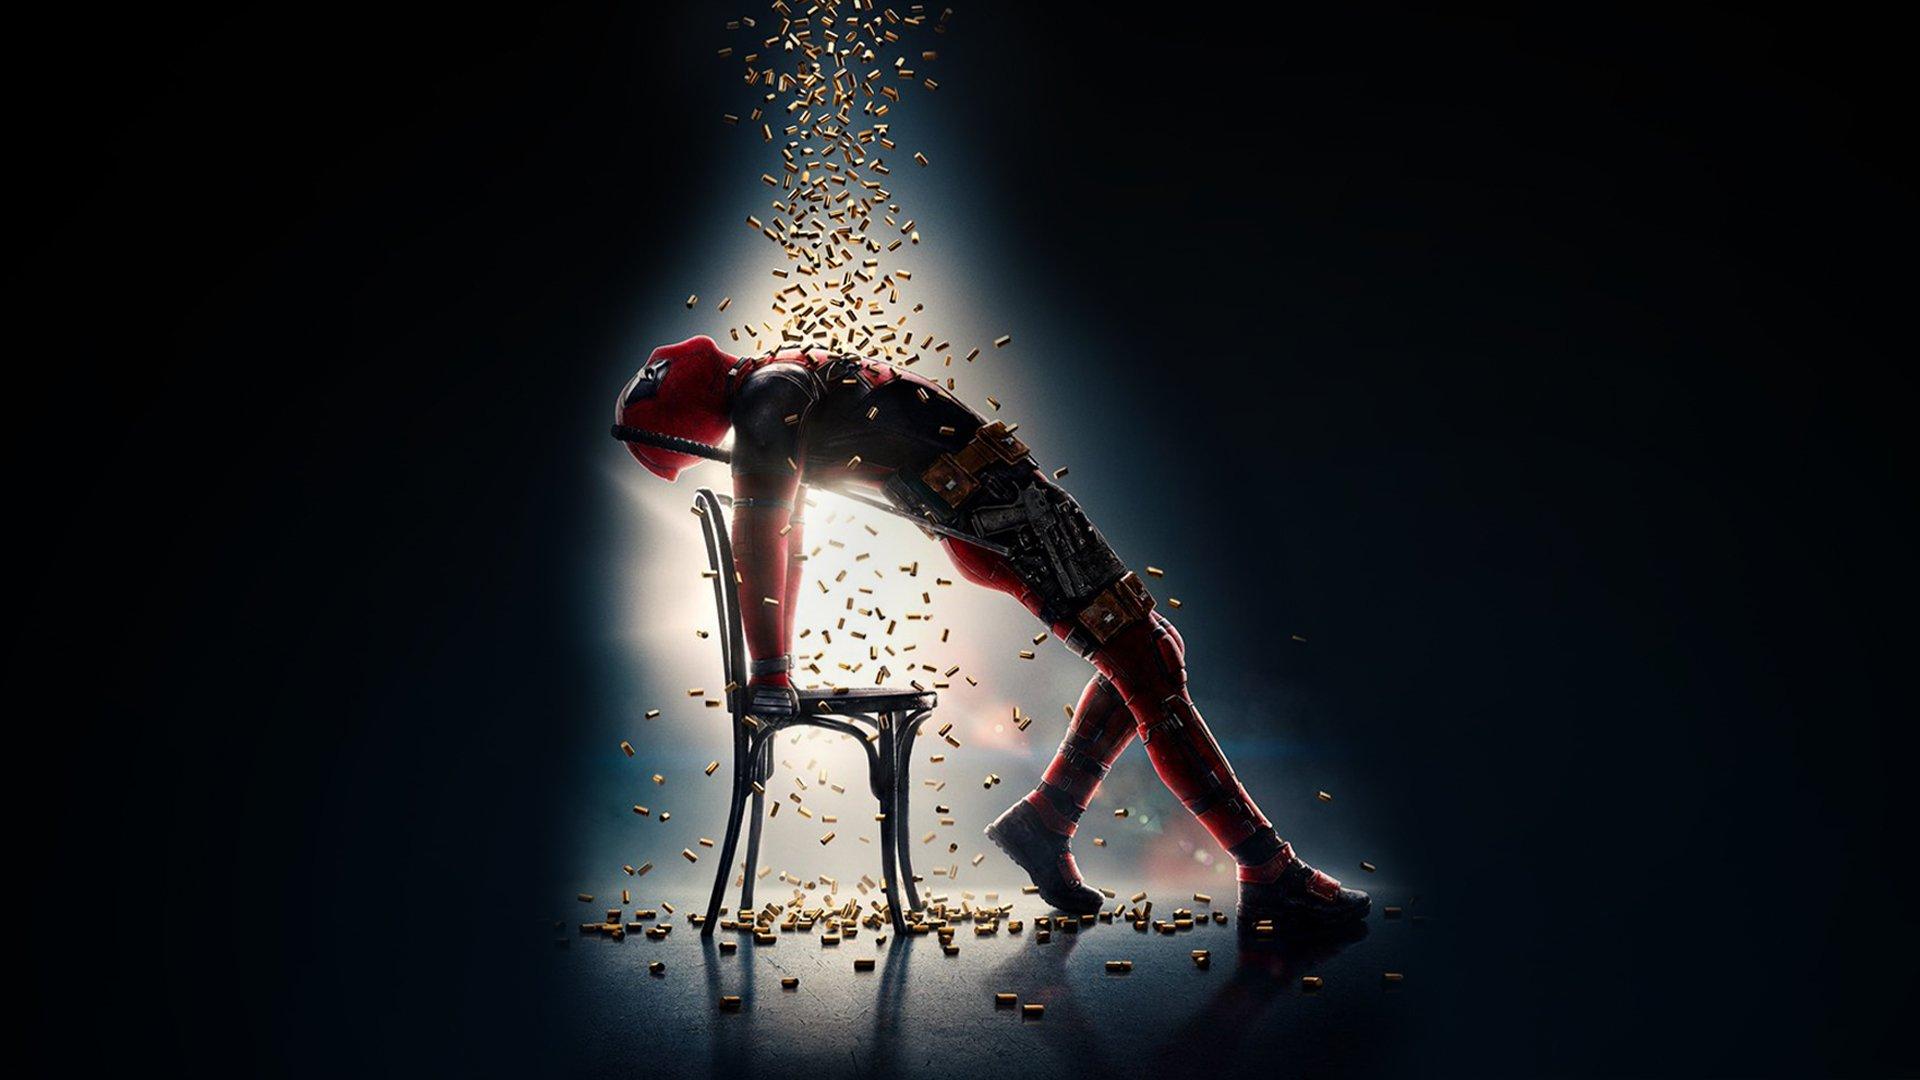 Deadpool 2 4K Background Image